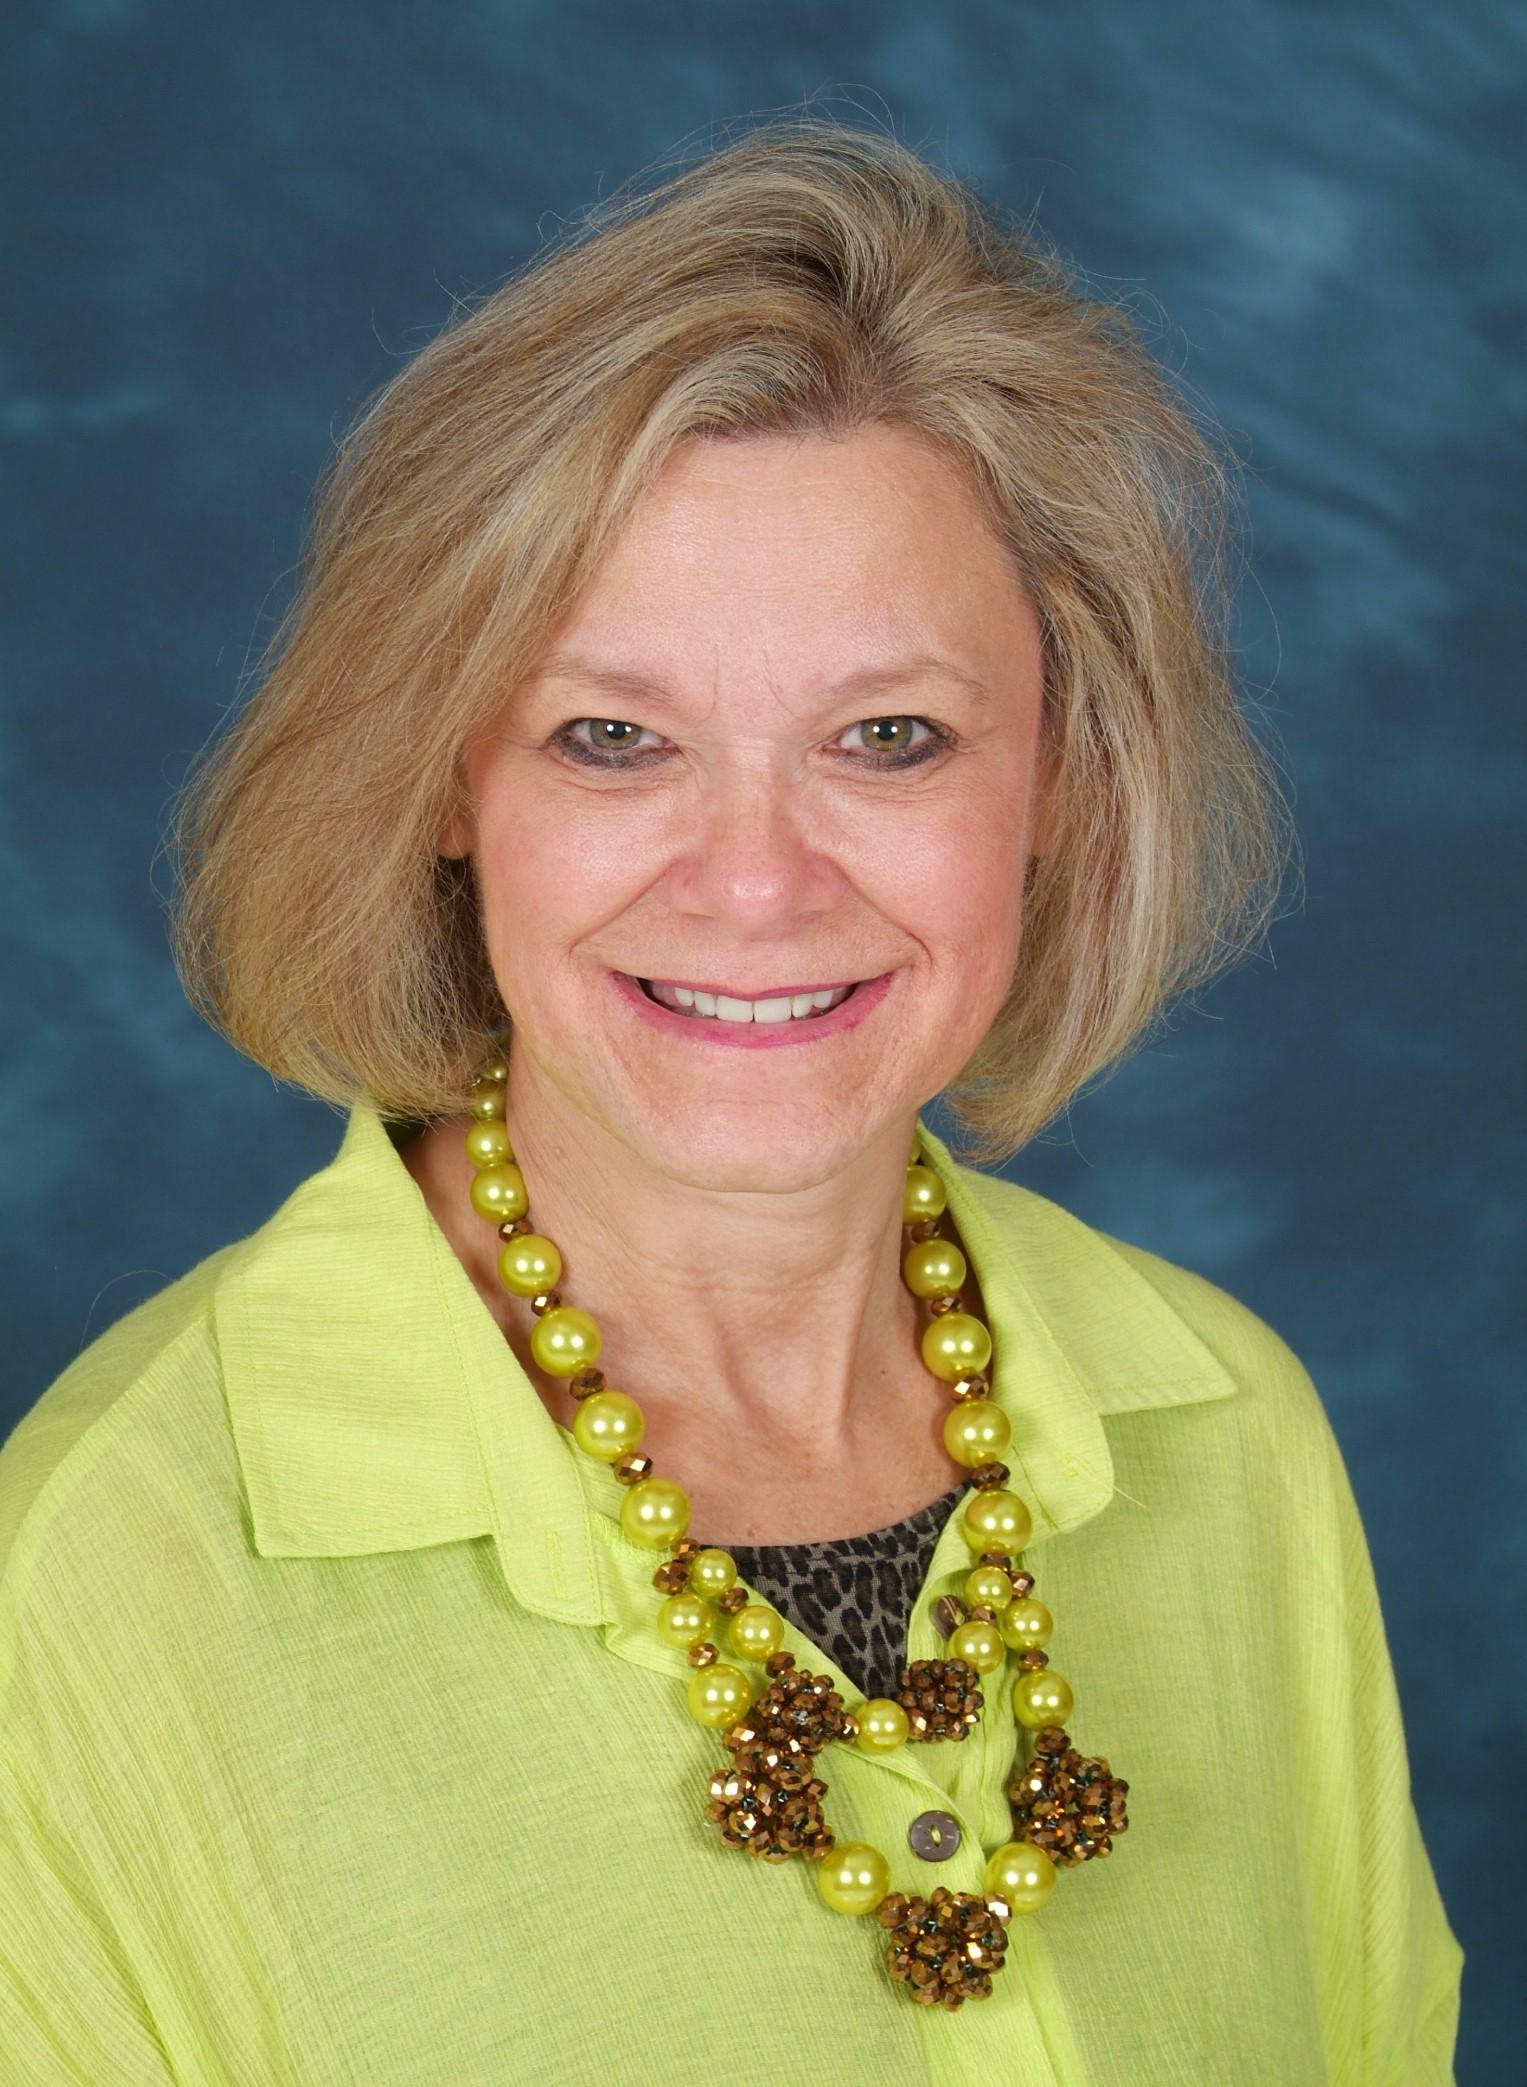 Dr. Terri Rhea